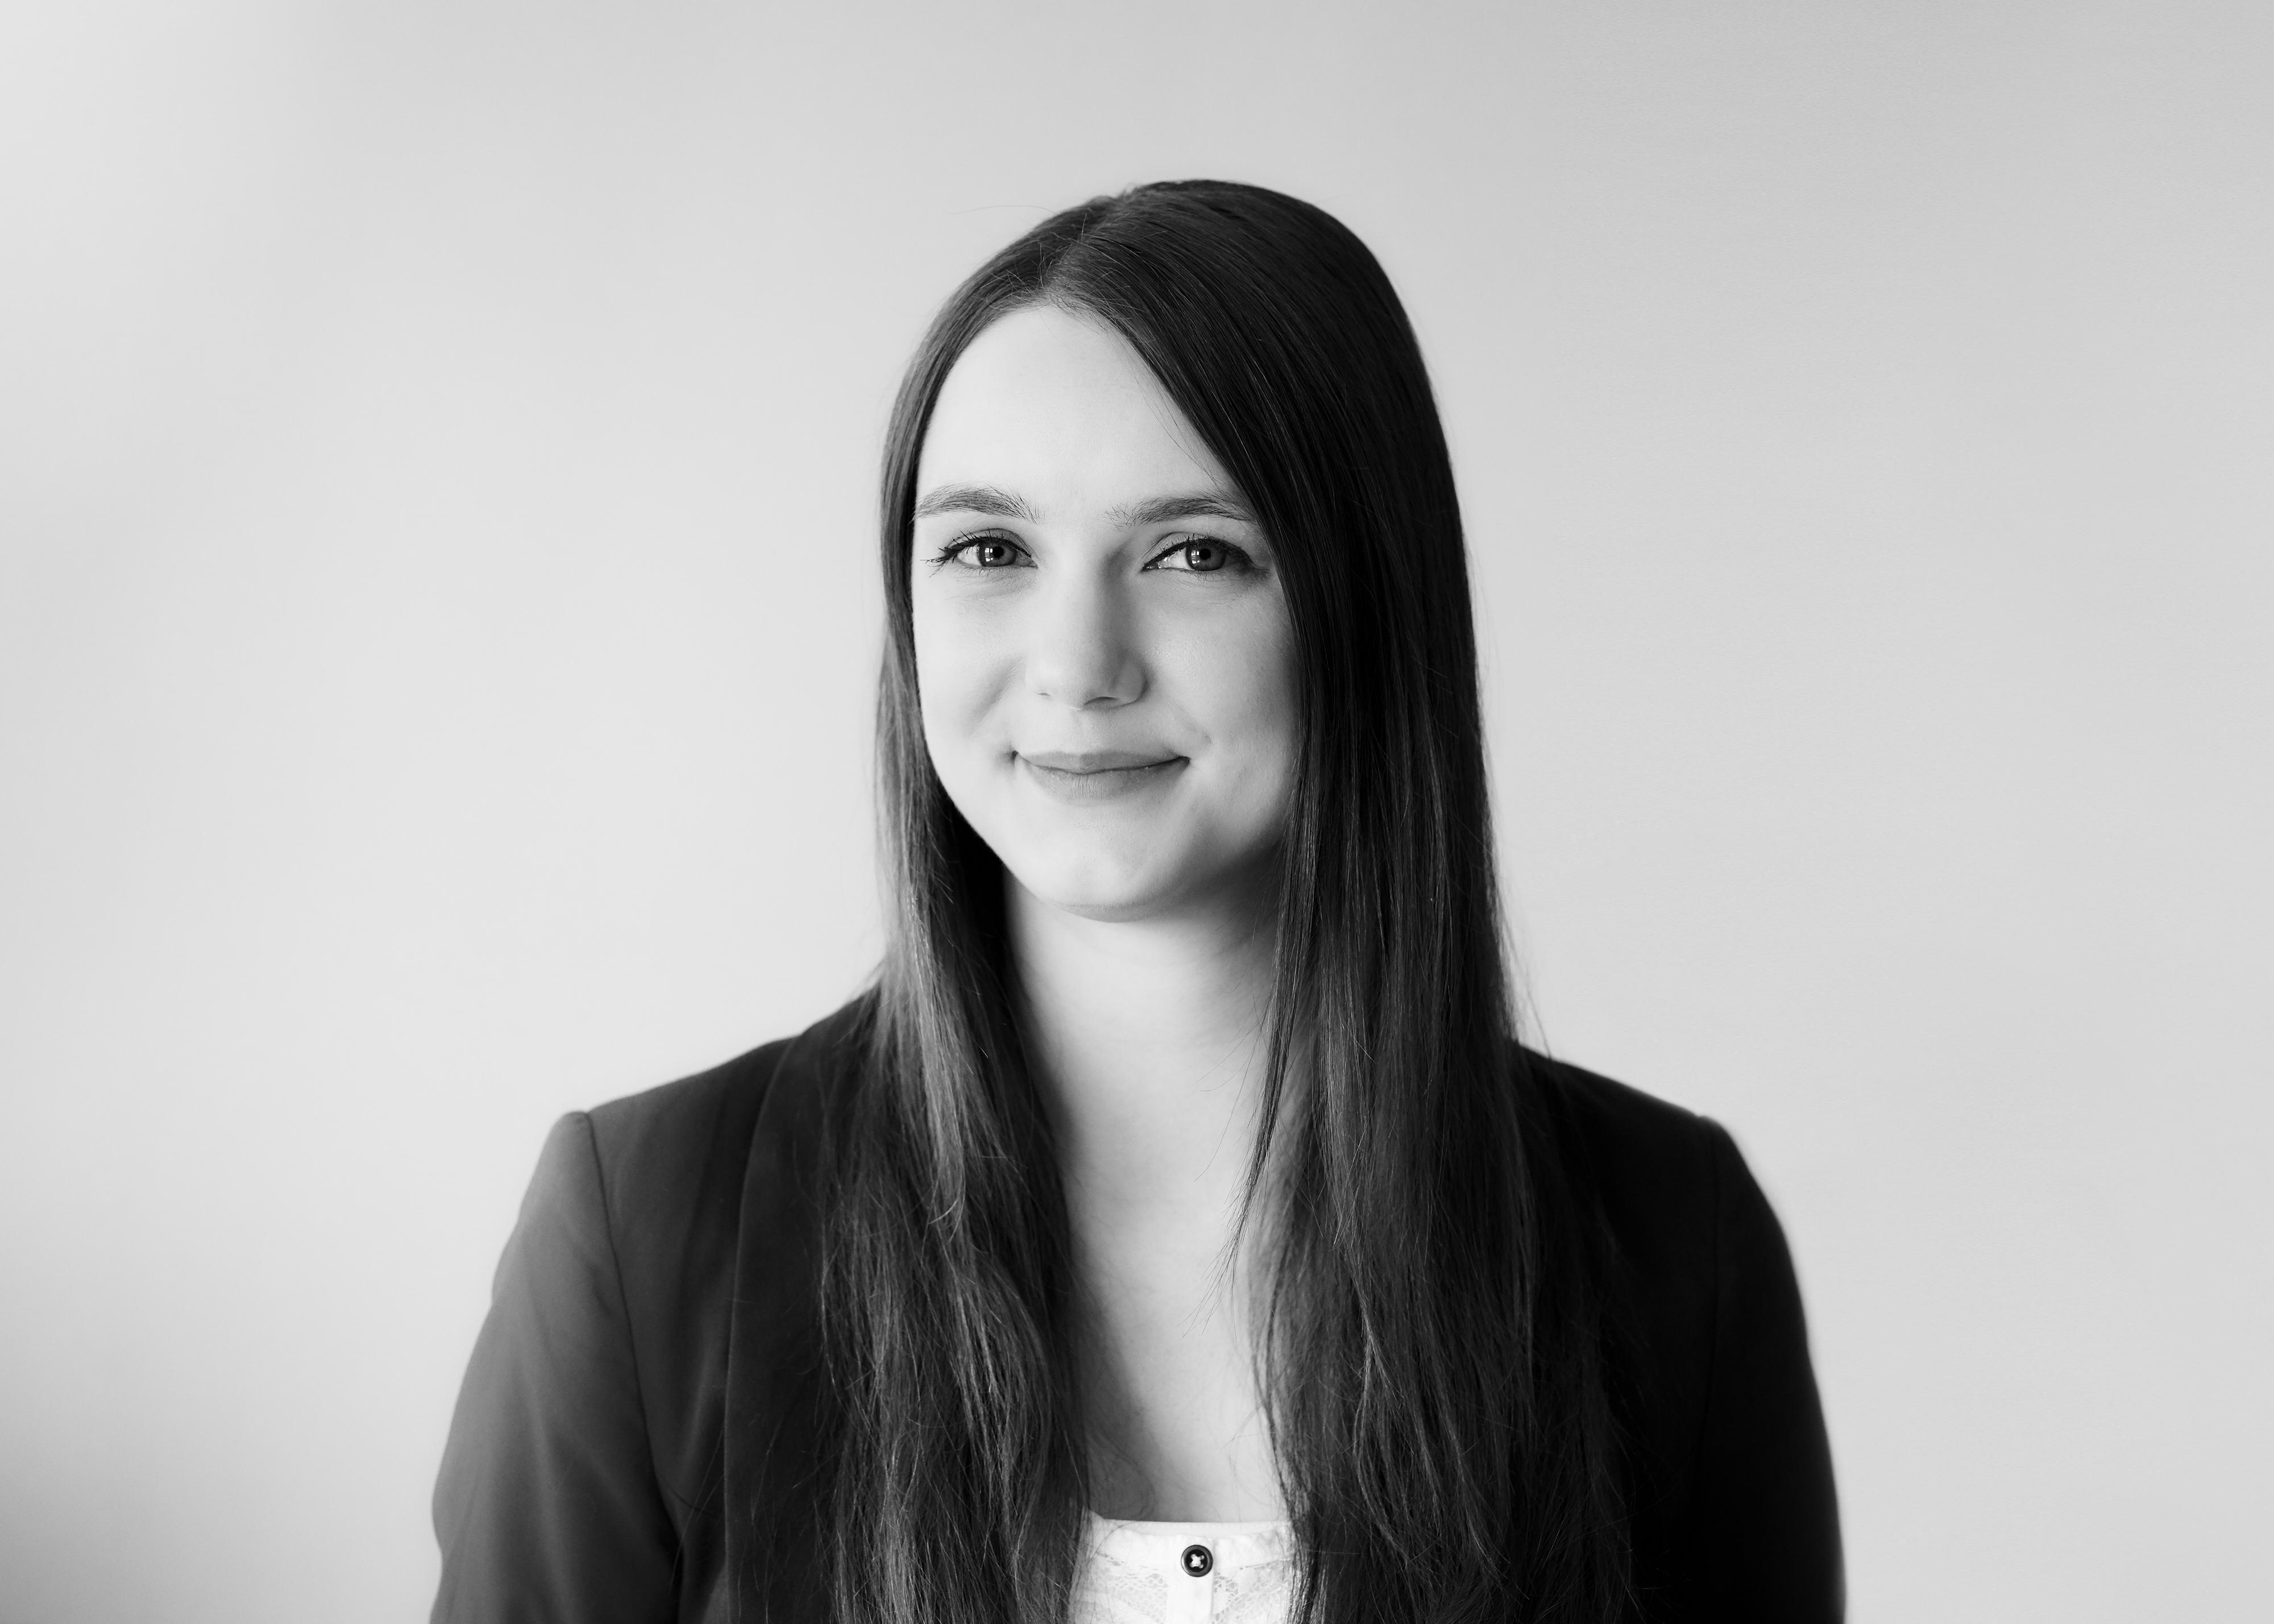 Johanna Bader